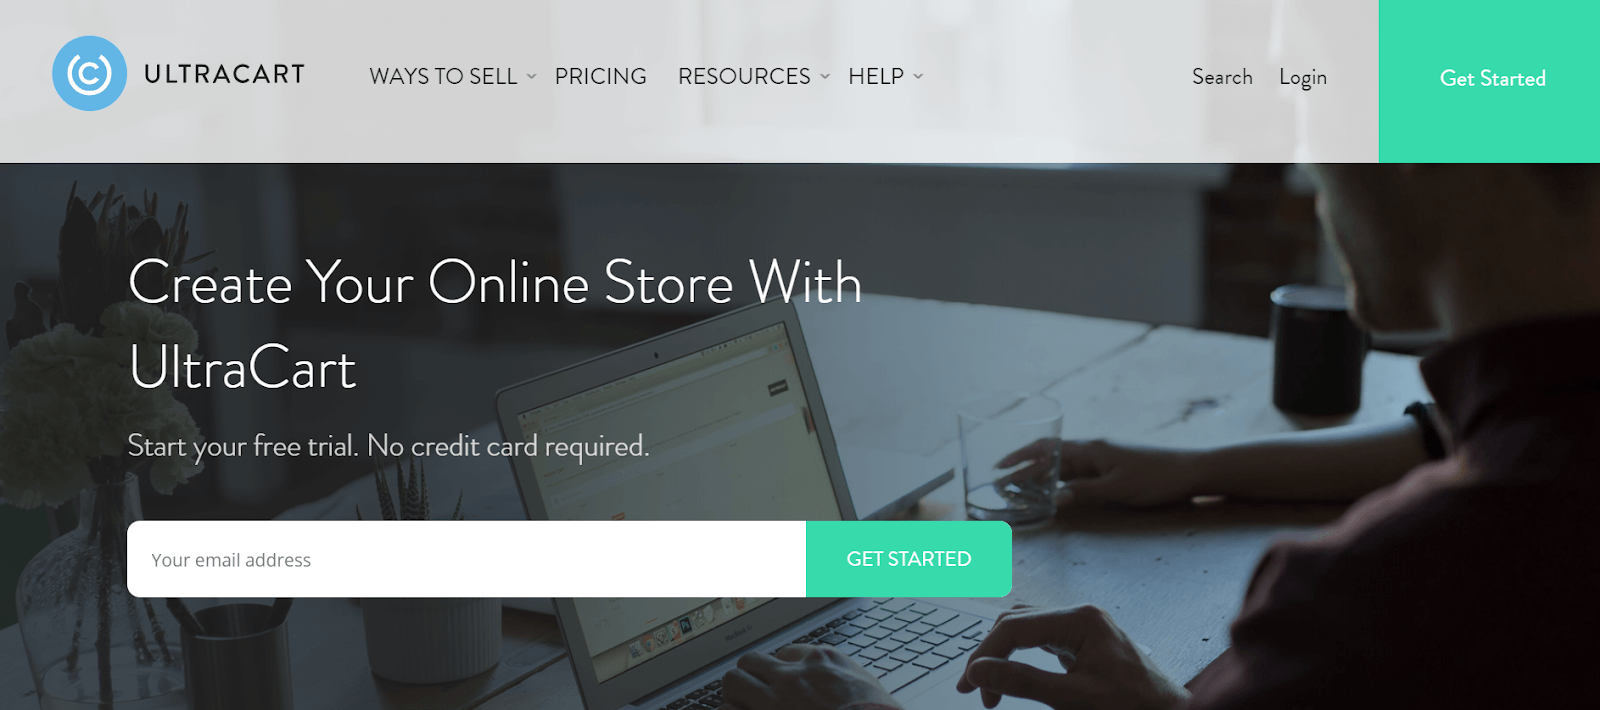 UltraCart Best eCommerce tools